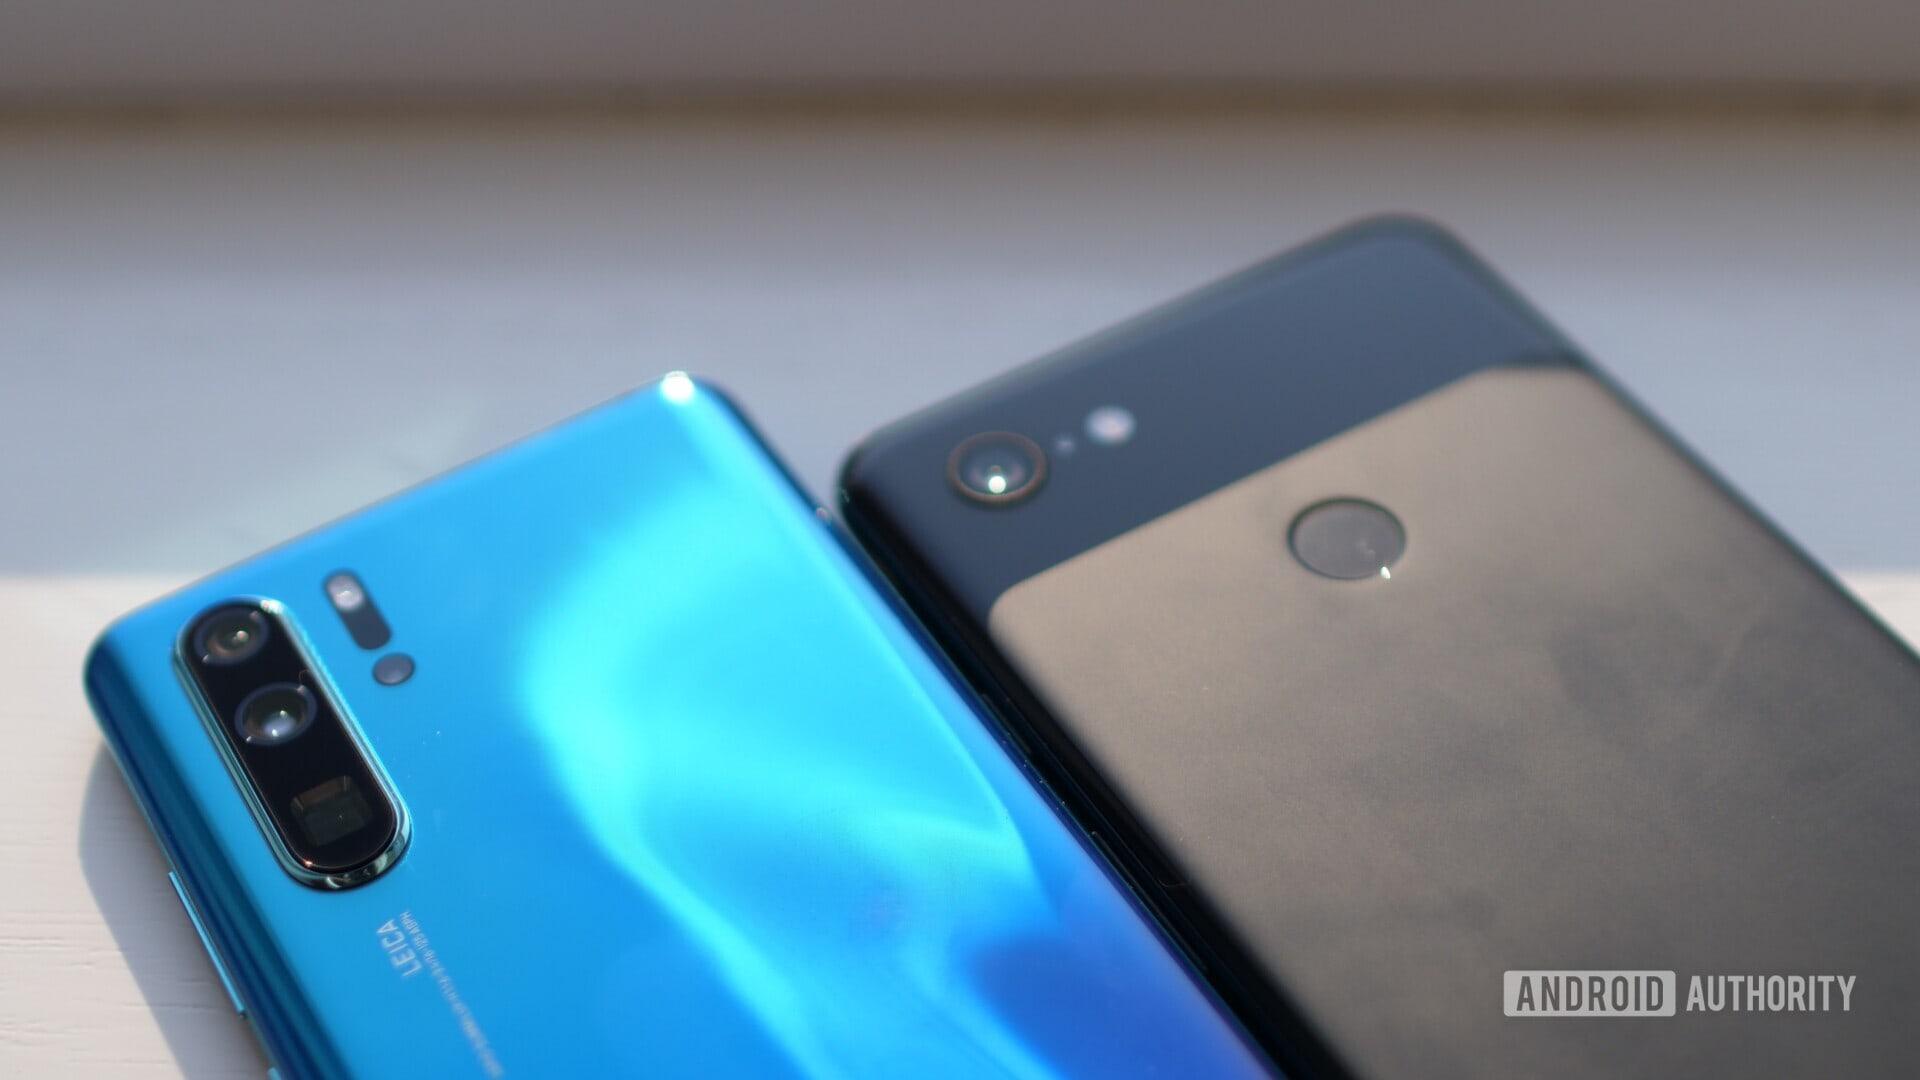 rear of blue huawei p30 pro vs black google pixel 3 xl